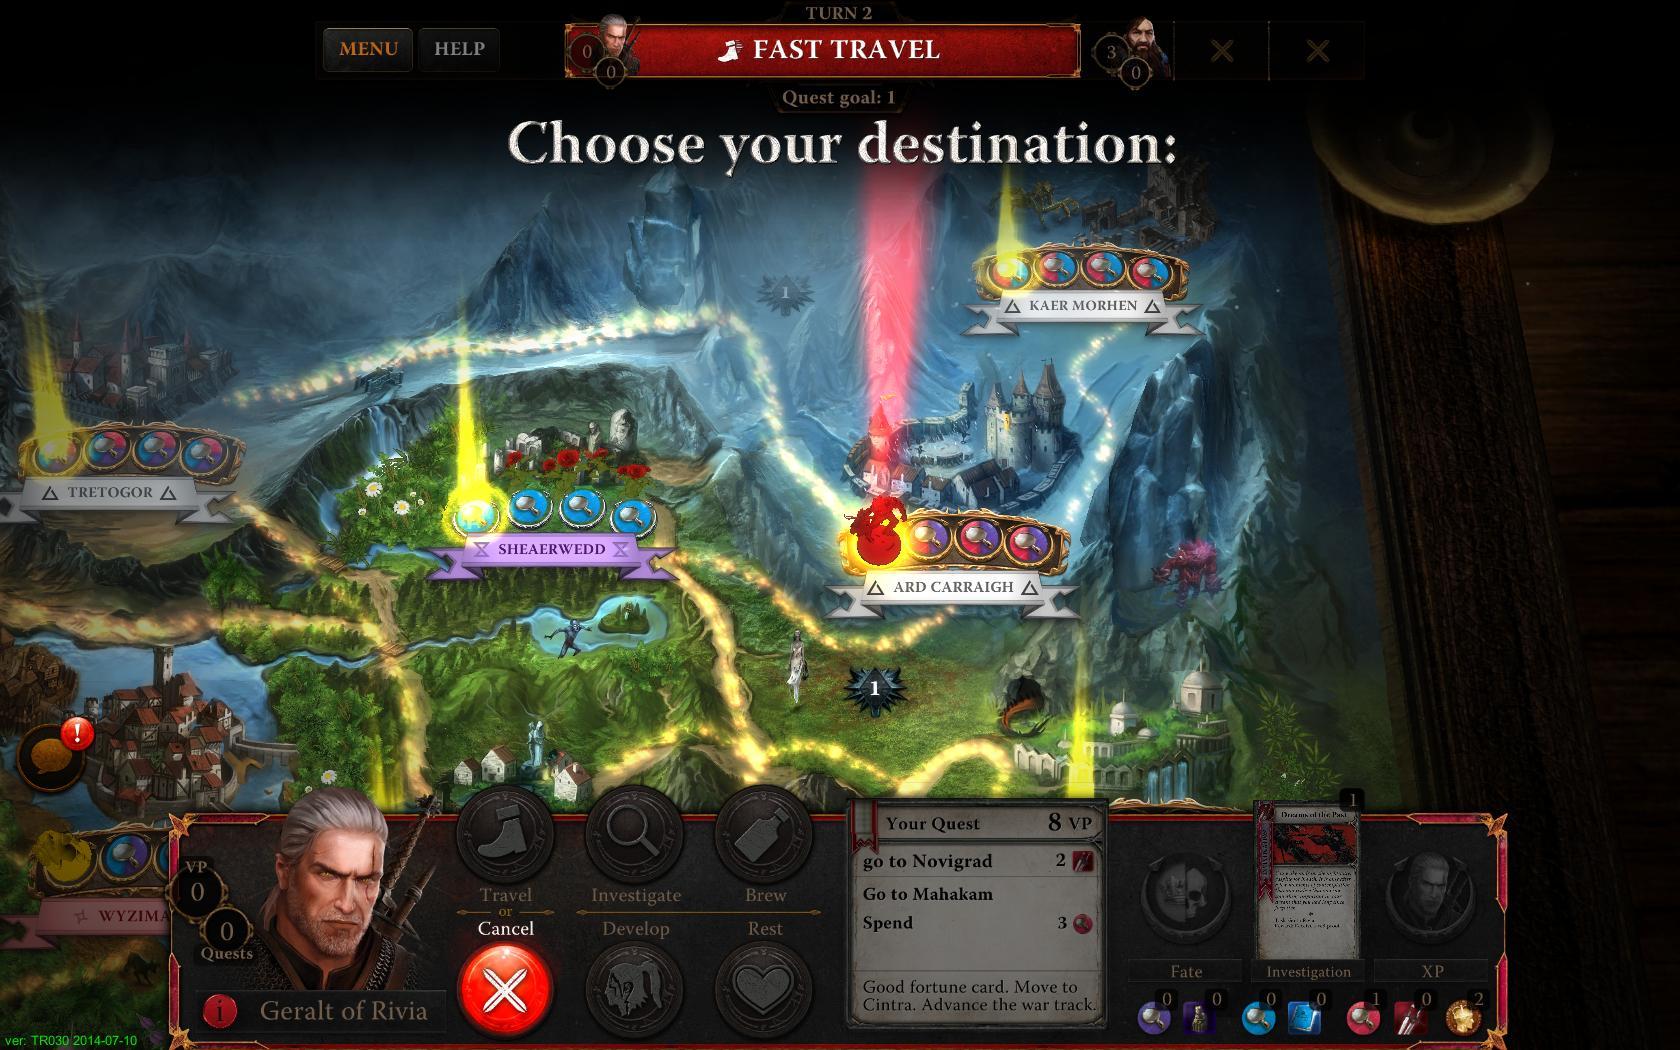 The Witcher: Adventure Game - dojmy z betatestu 98854